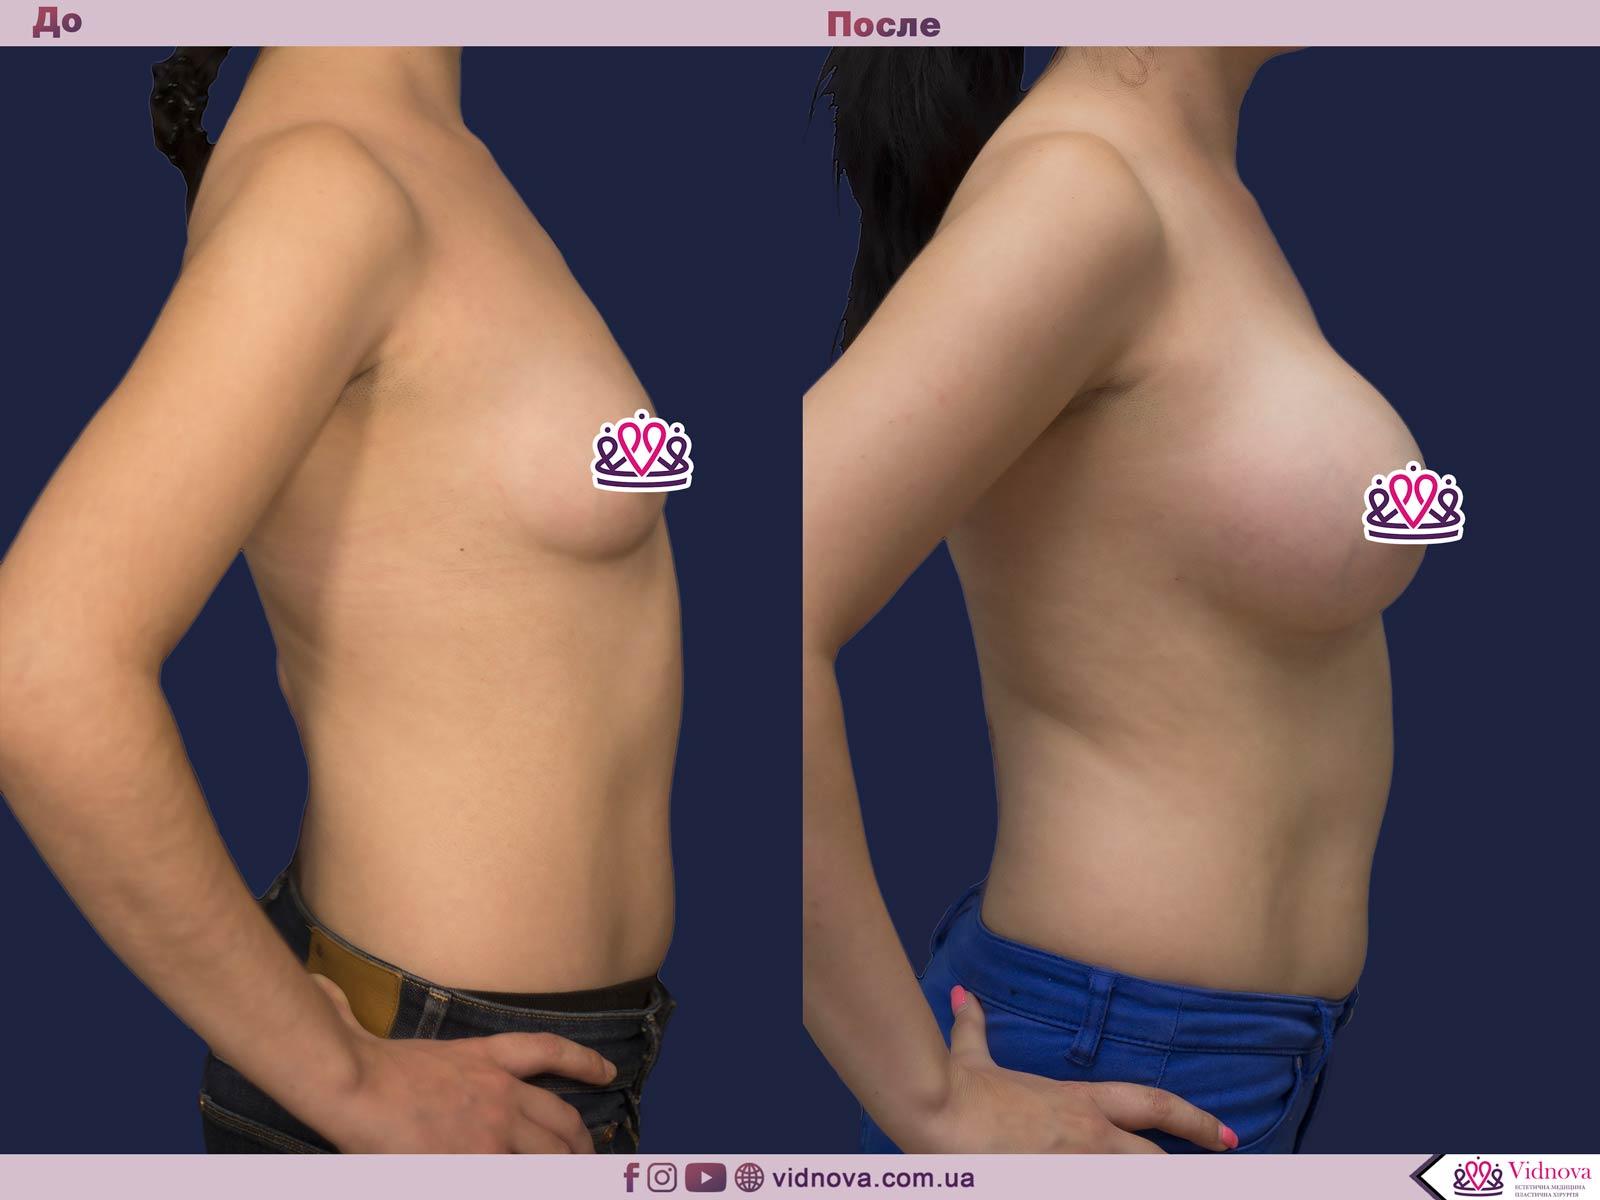 Увеличение груди: Фото ДО и ПОСЛЕ - Пример №78-3 - Клиника Vidnova